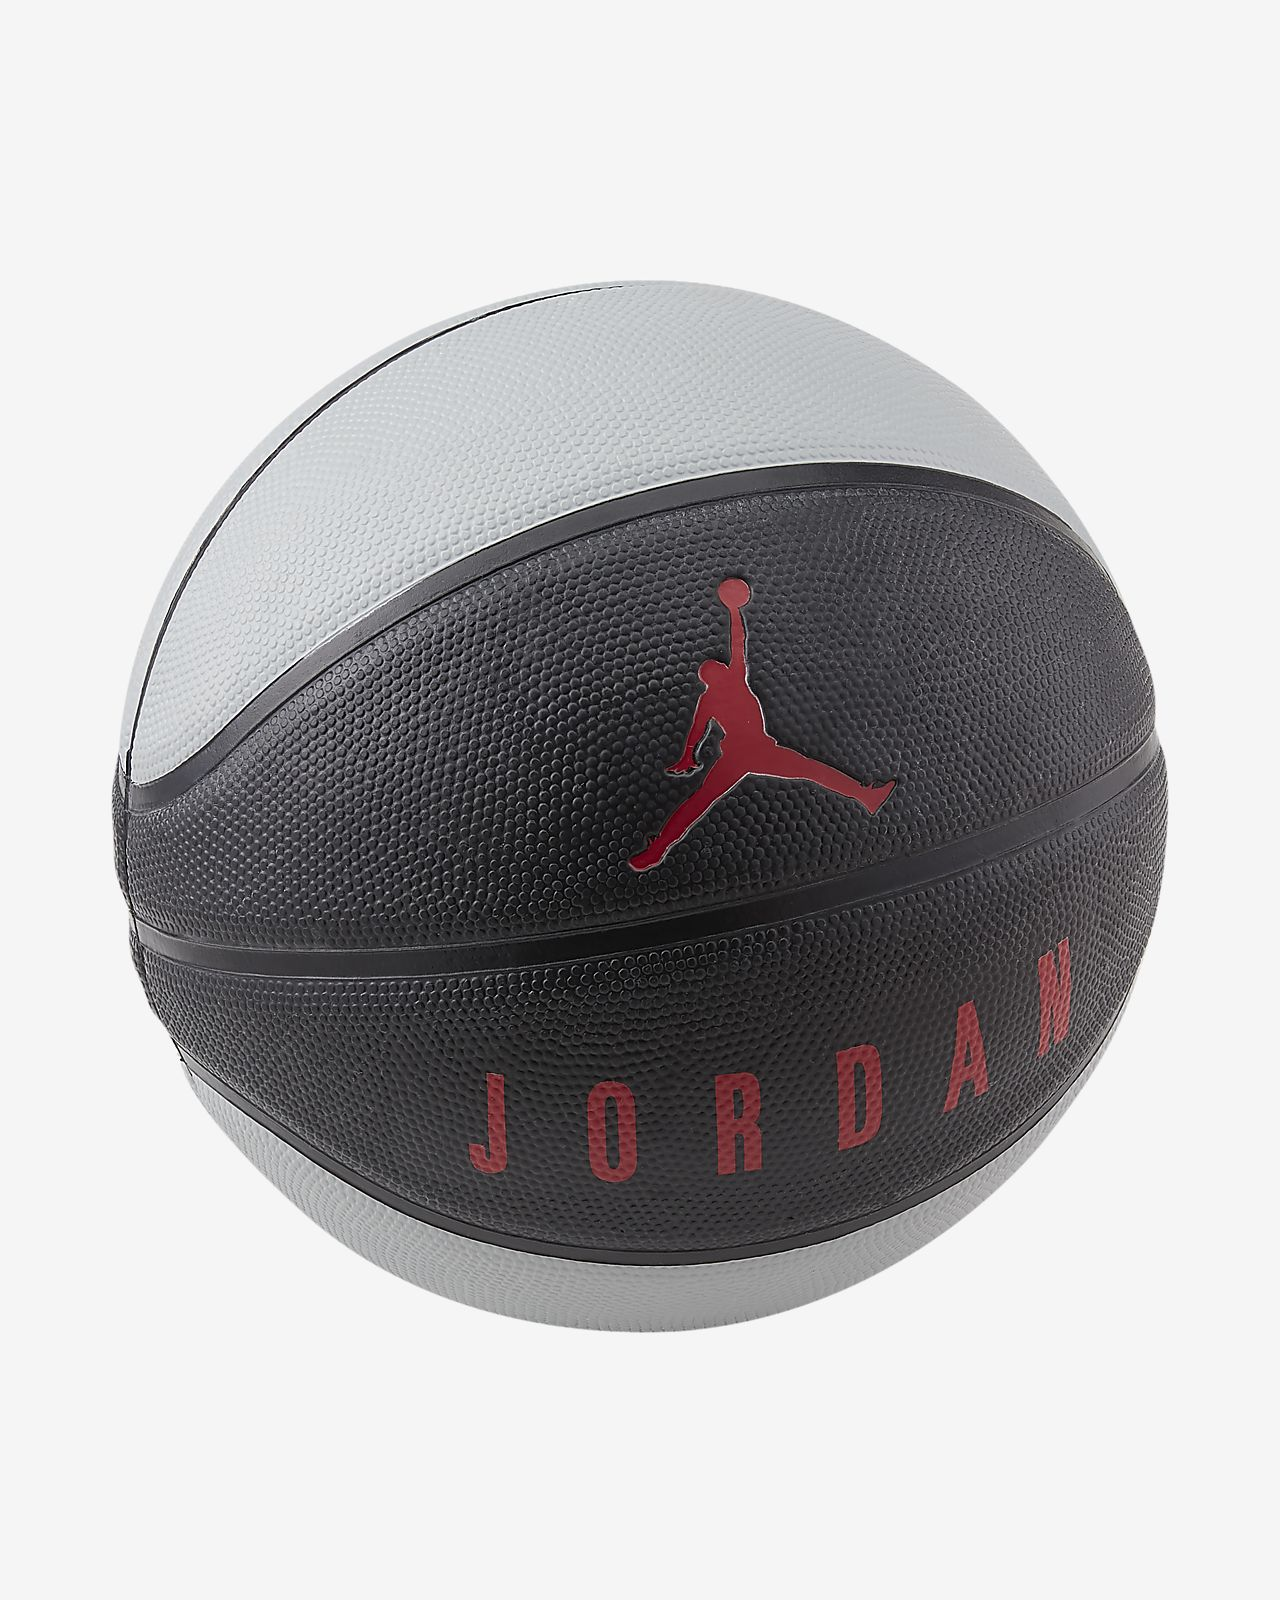 Pallone da basket Jordan Playground 8P